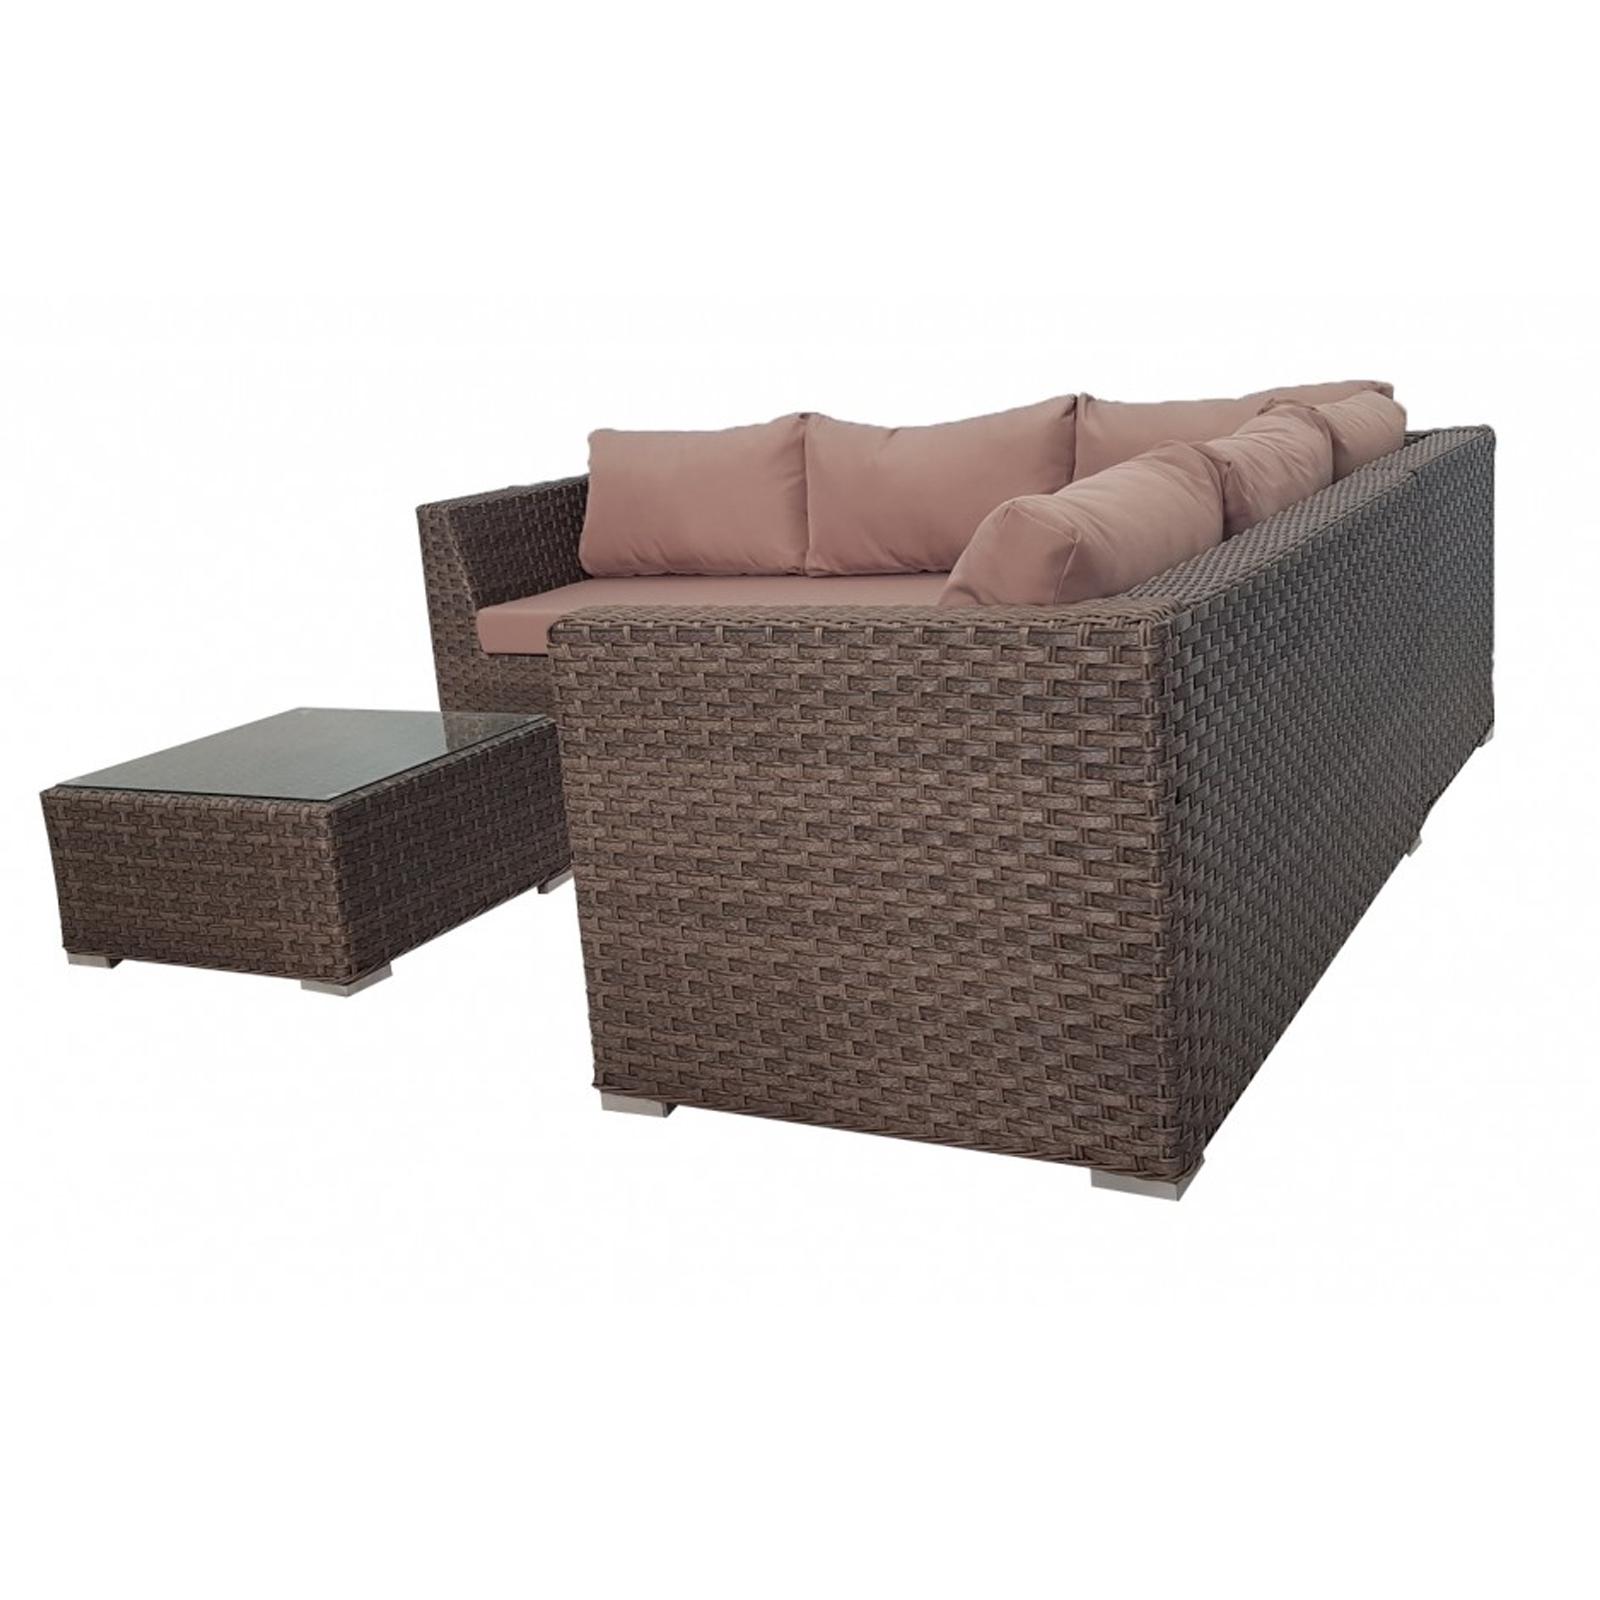 Rattan Corner Sofa Abreo: Brown Outdoor Wicker Rattan Sofa Corner Lounge Set